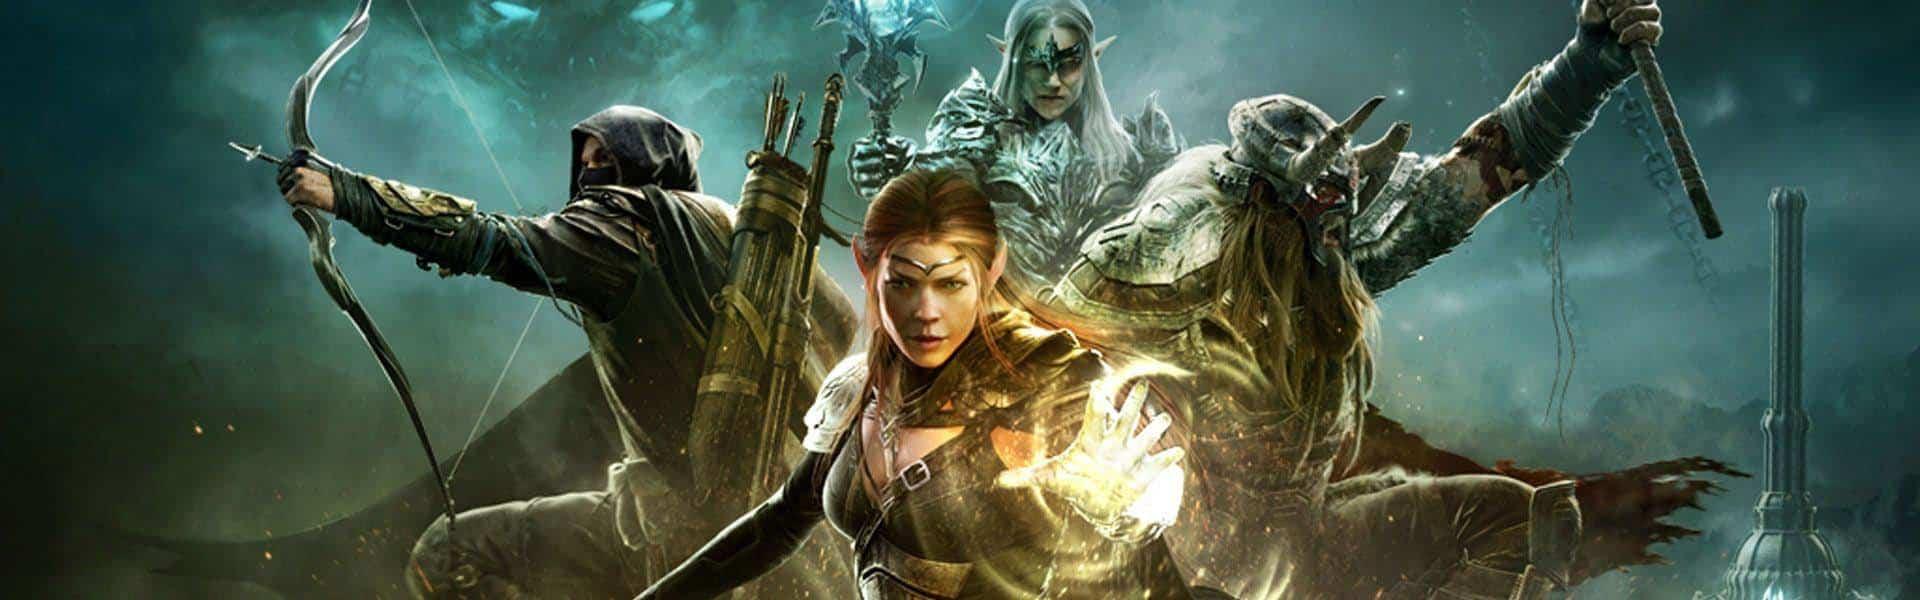 The Elder Scrolls 6 Release Date, Trailer, News and Rumors